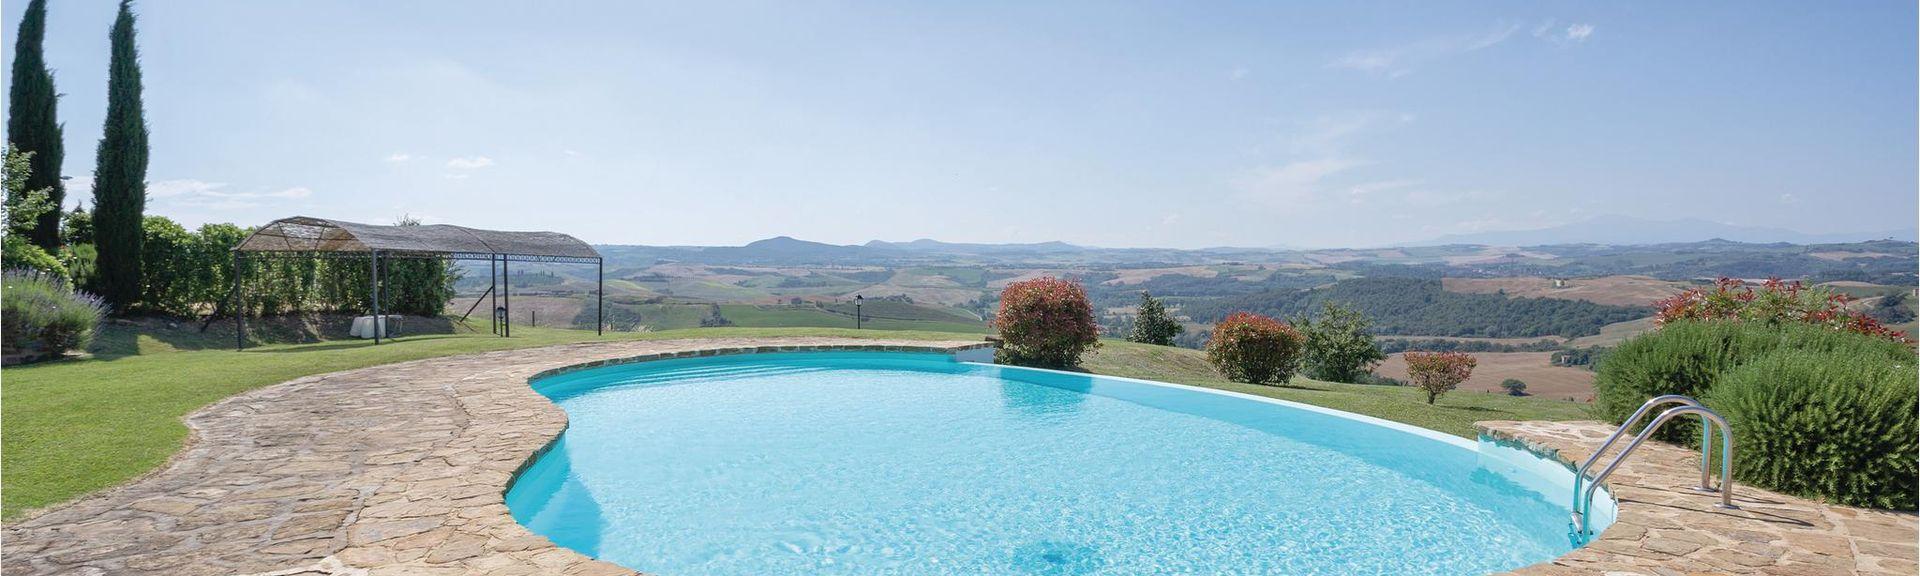 Bucine, Tuscany, Italy